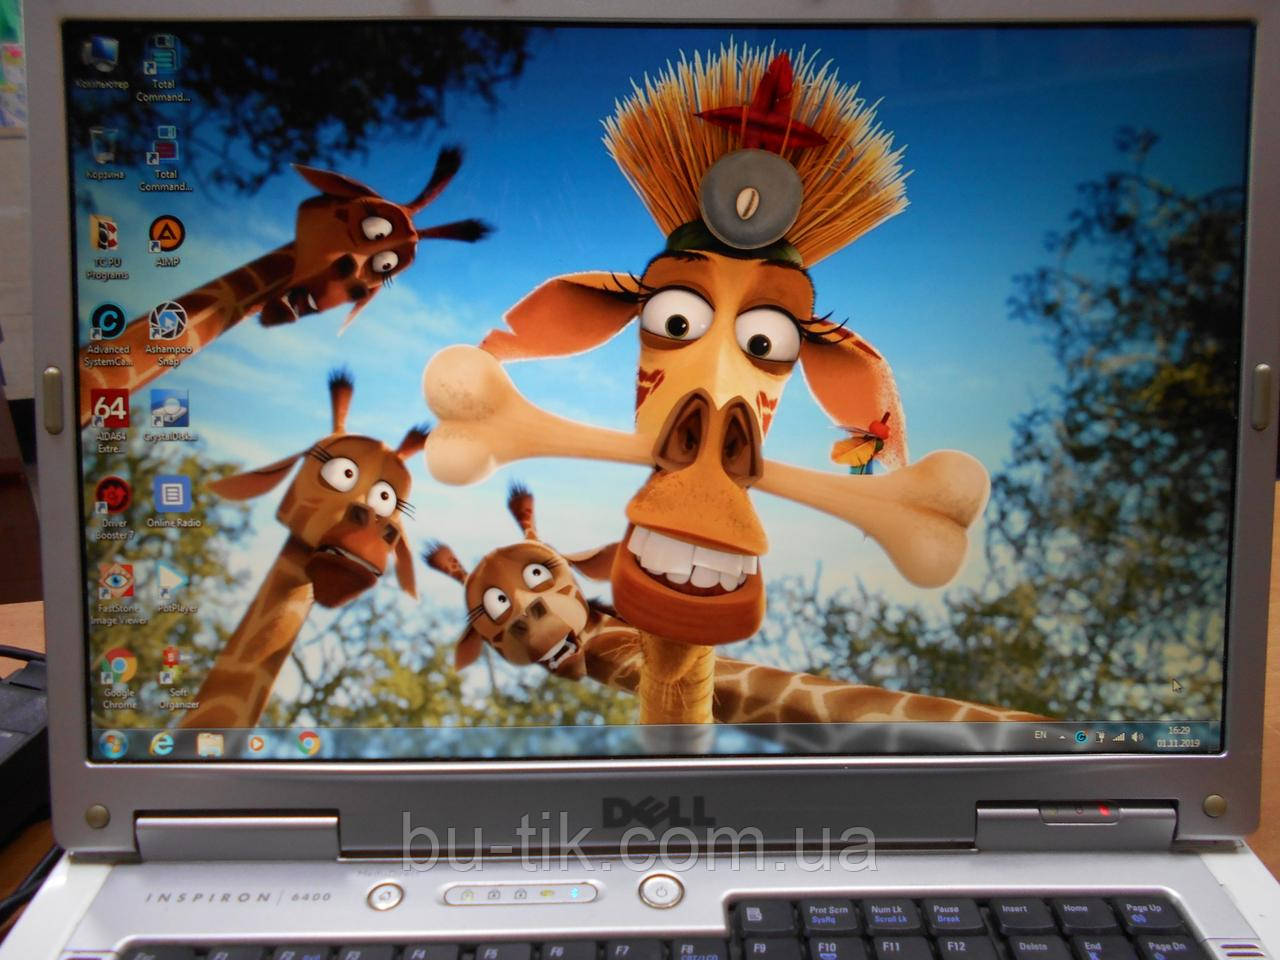 Ноутбук Dell Inspirion 6400 15,4 Pentium T7200 2 GHz DDR2 4Gb SSD